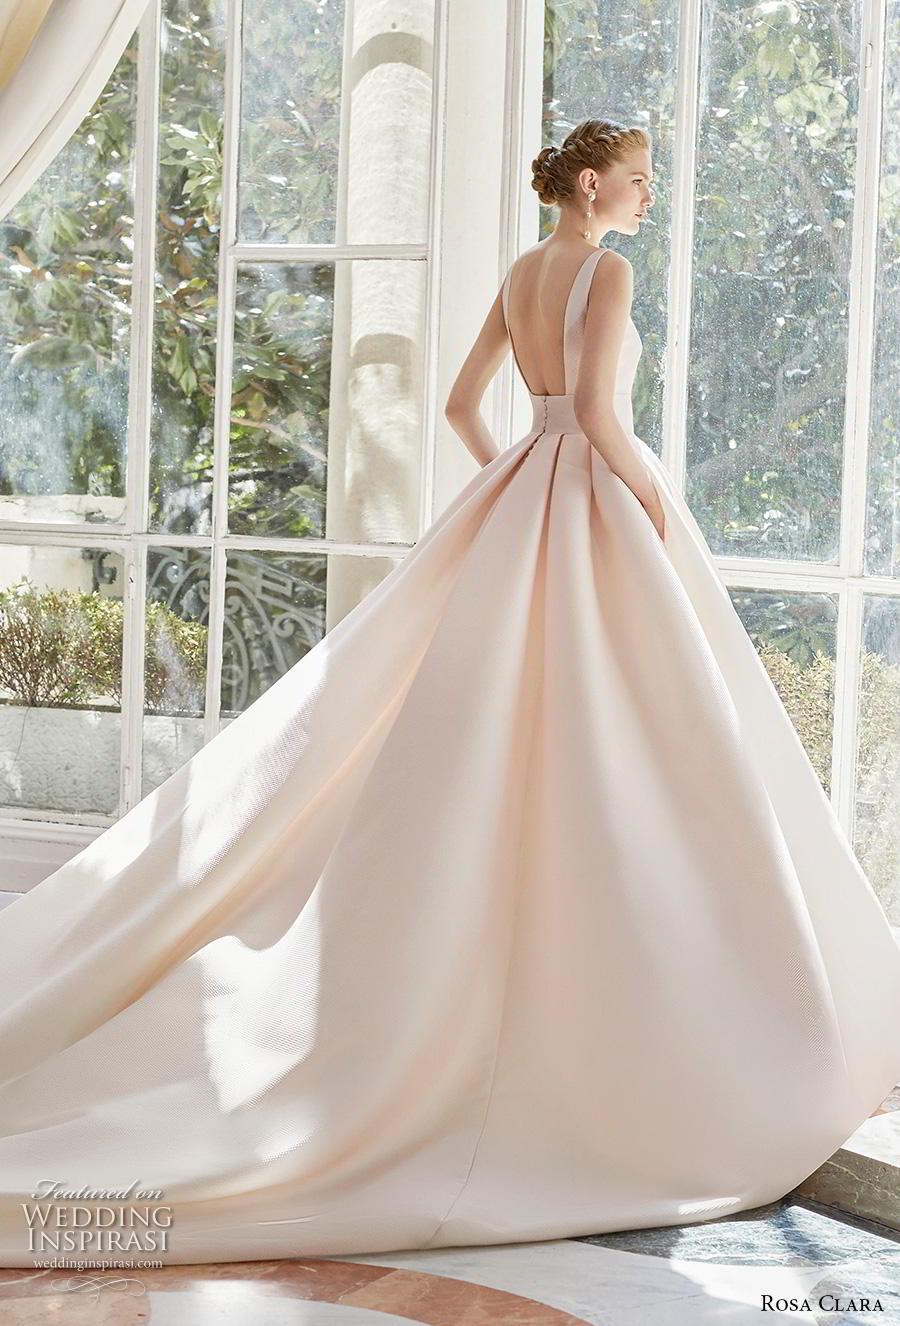 rosa clara 2019 couture bridal sleeveless deep v neck simple minimalist elegant princess blush a  line wedding dress pockets backless royal train (1) bv